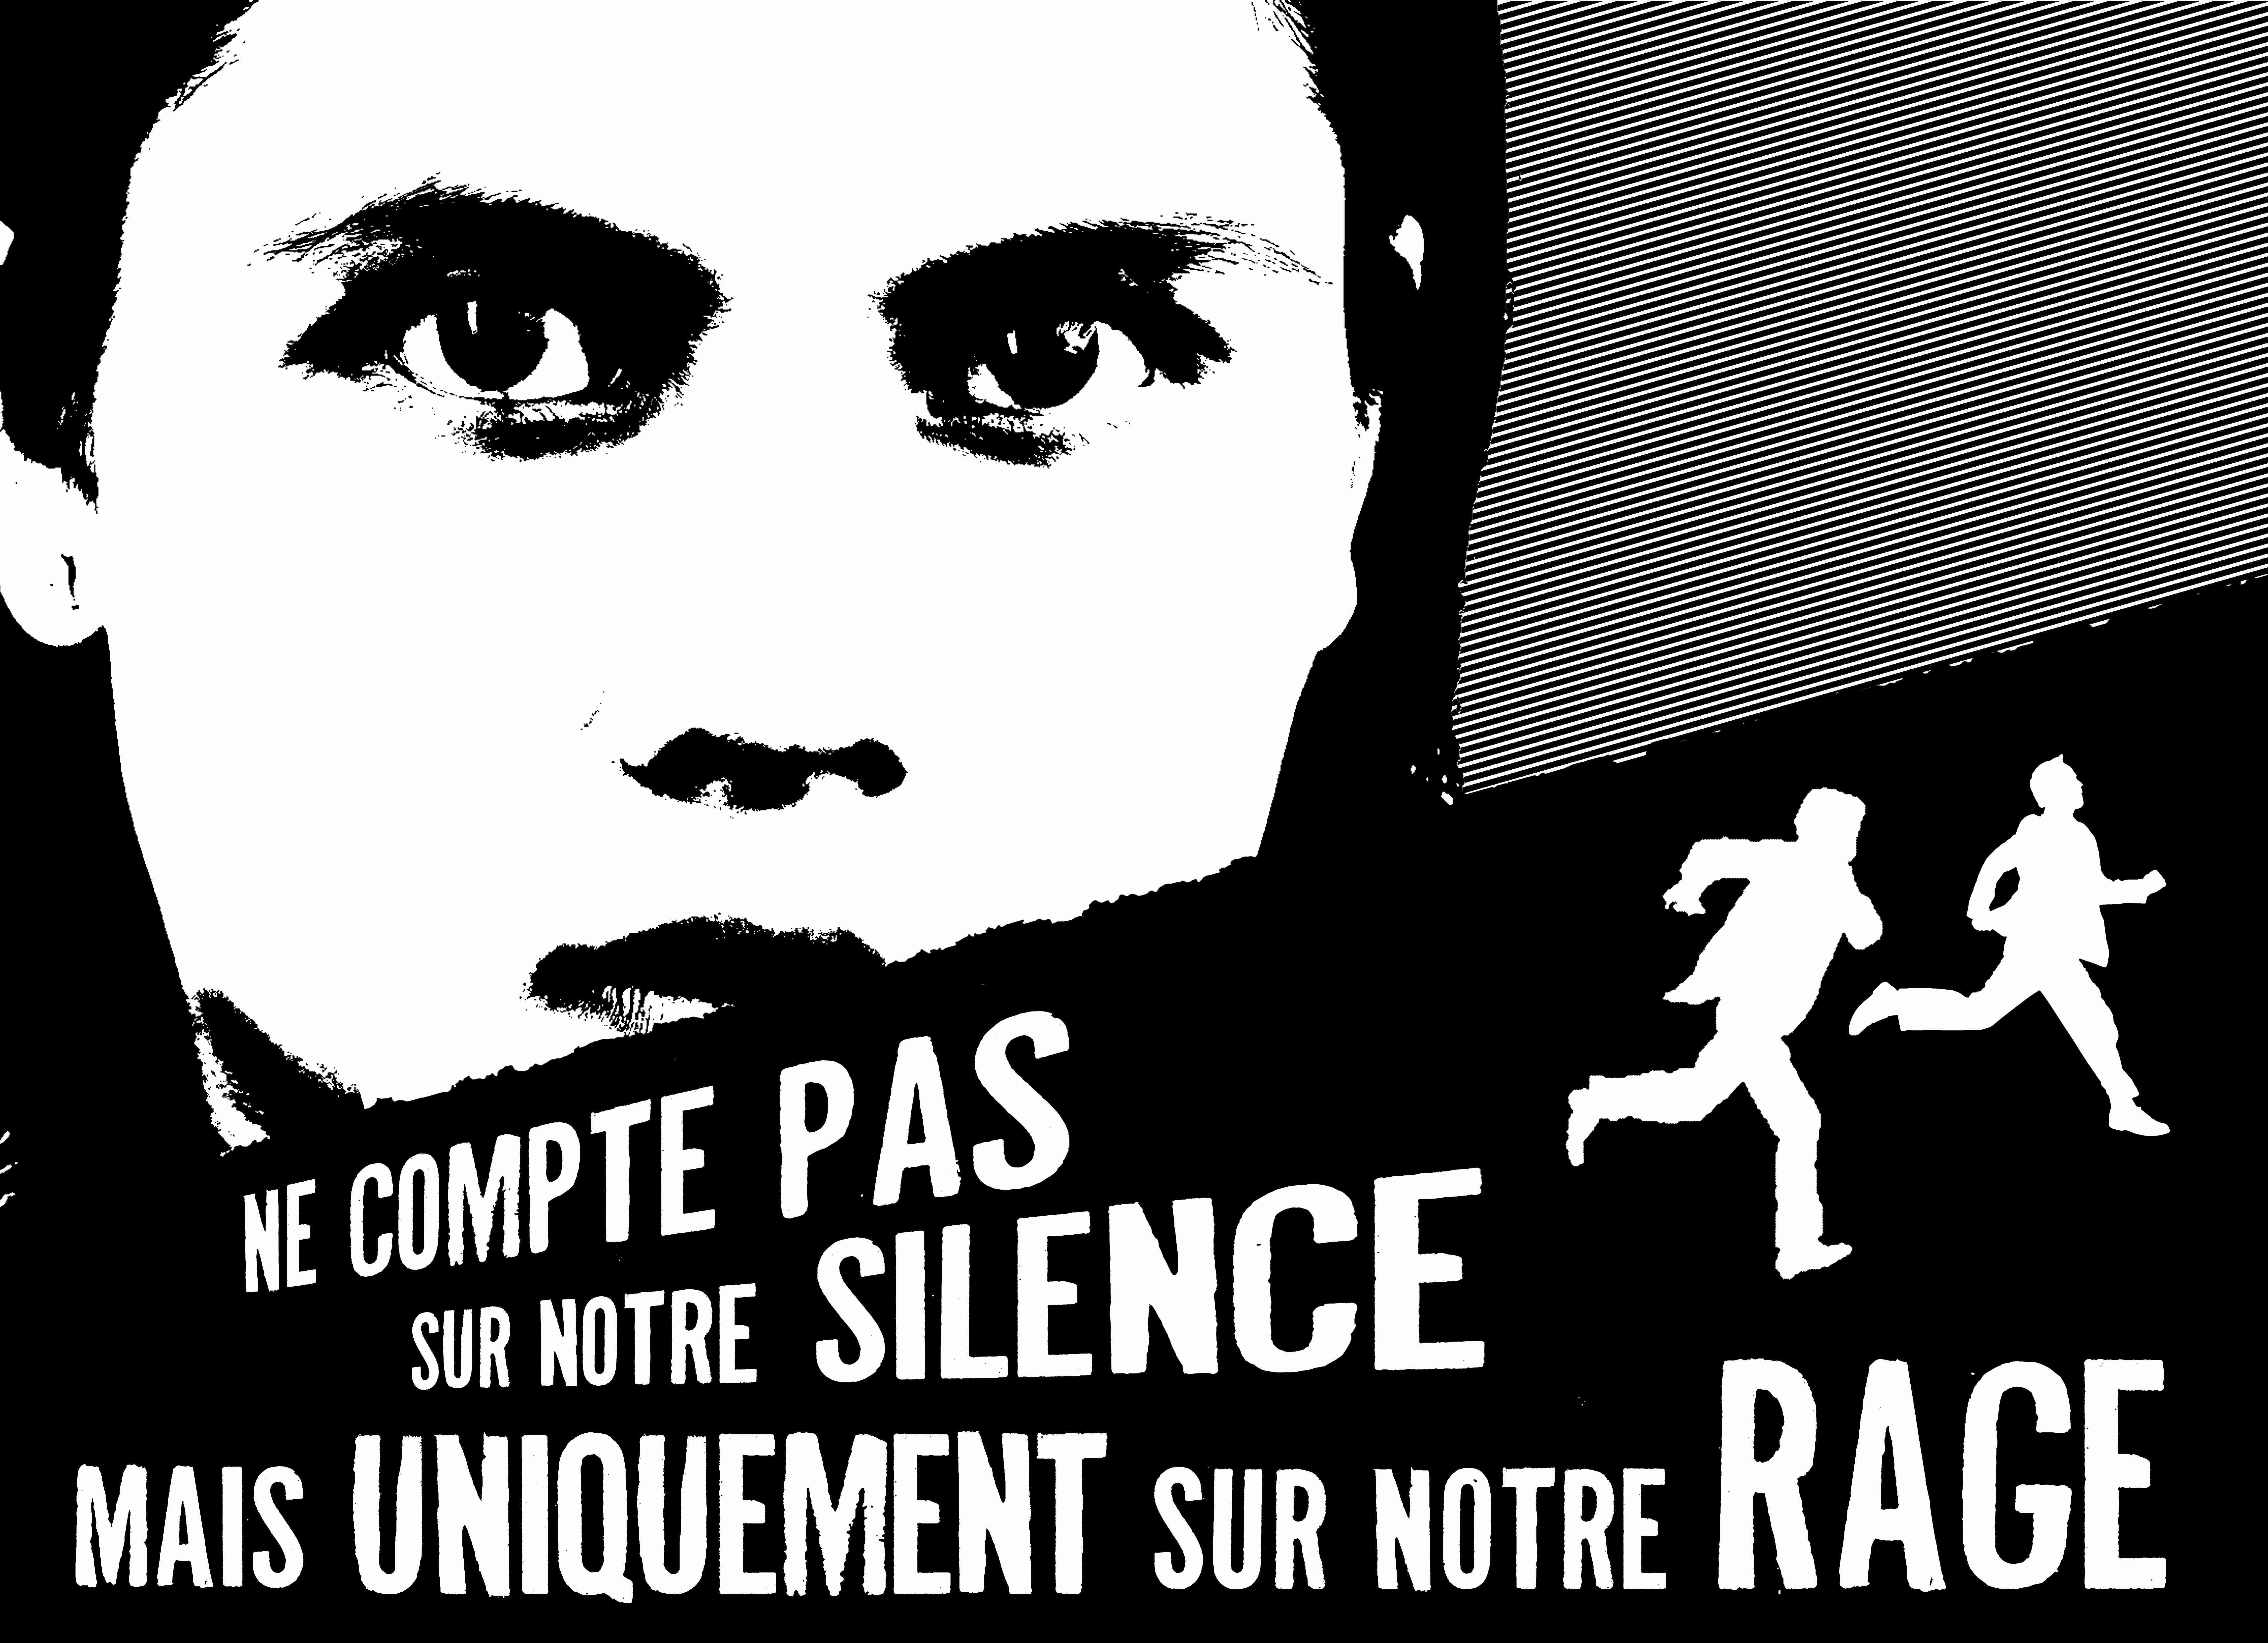 http://anarchafeministe.noblogs.org/files/2013/11/Affiche-visuel.jpg